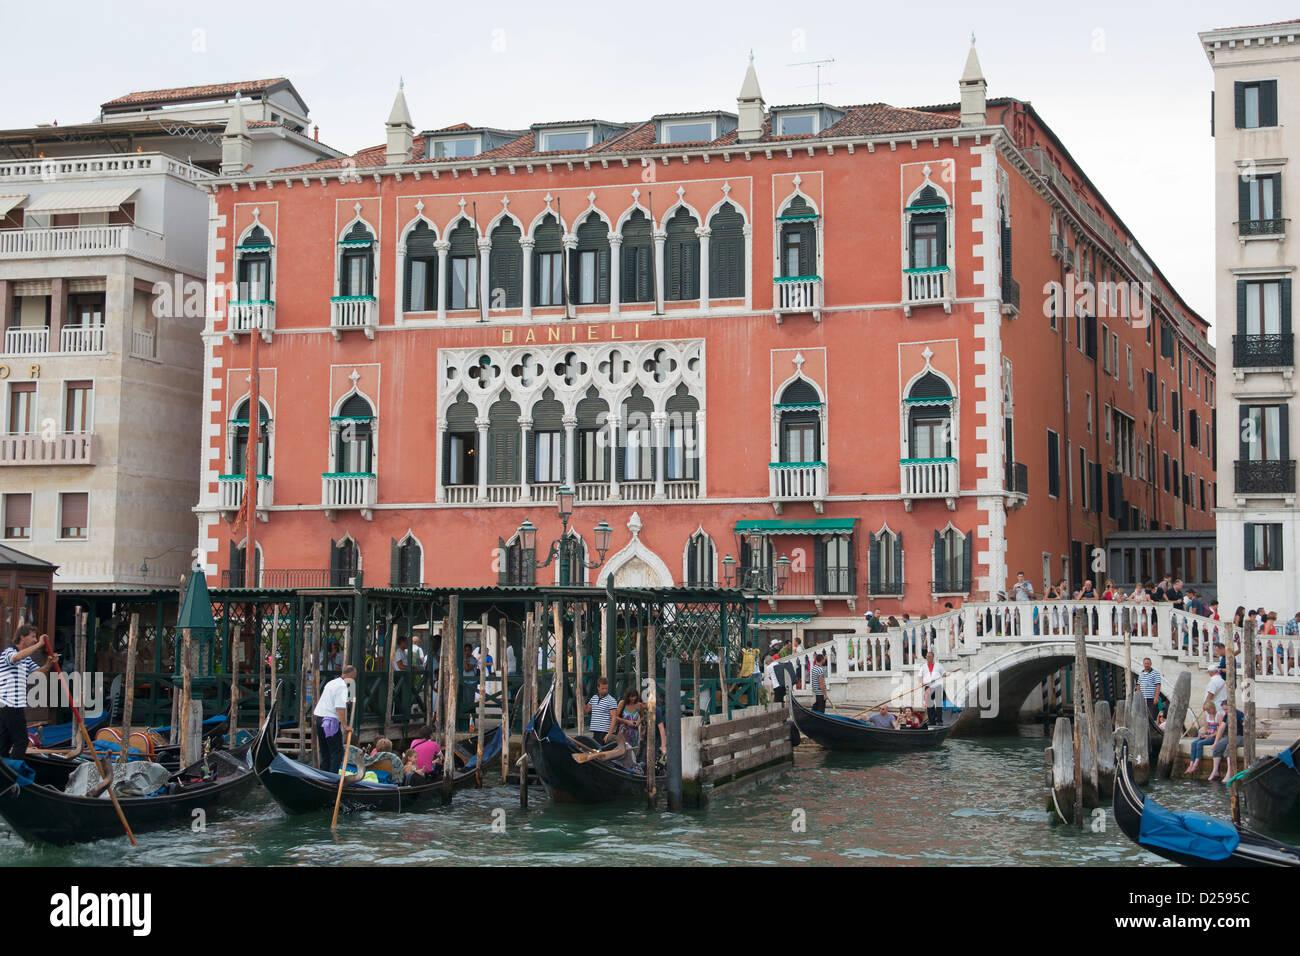 Hotel Danieli Gonola Boat Ship Water House River